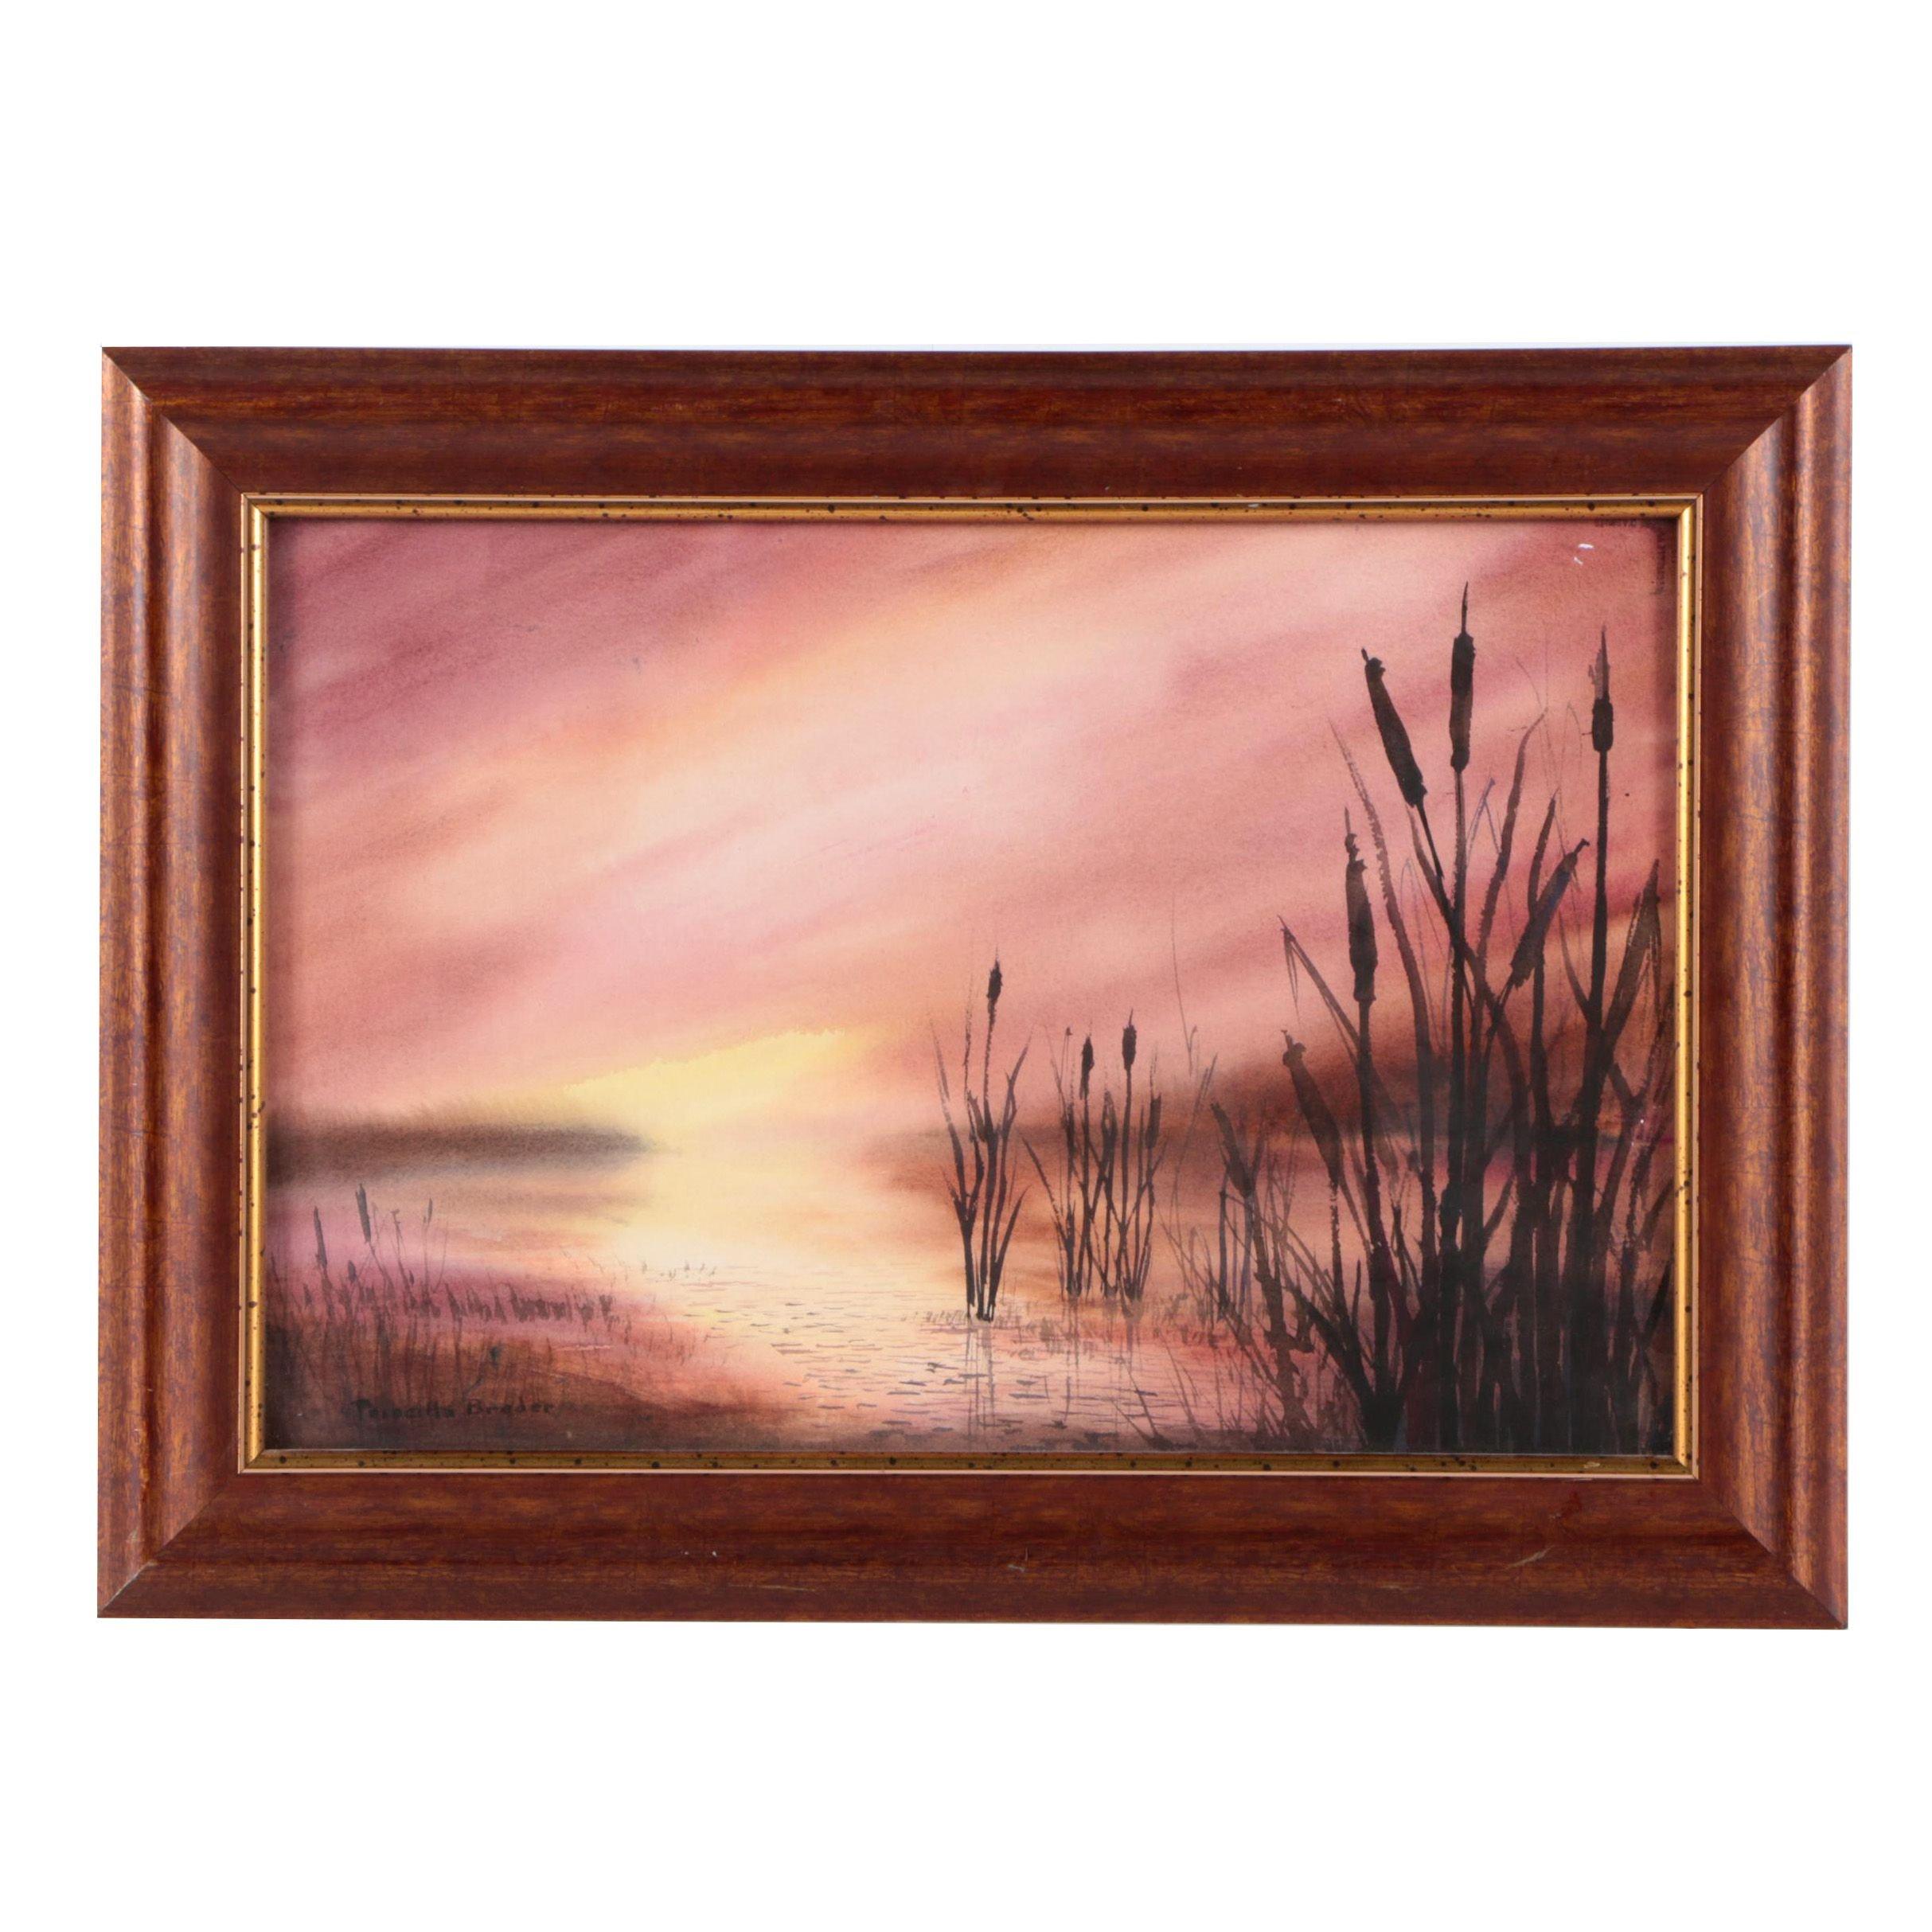 Priscilla Breder Watercolor on Paper of a Sunset Landscape